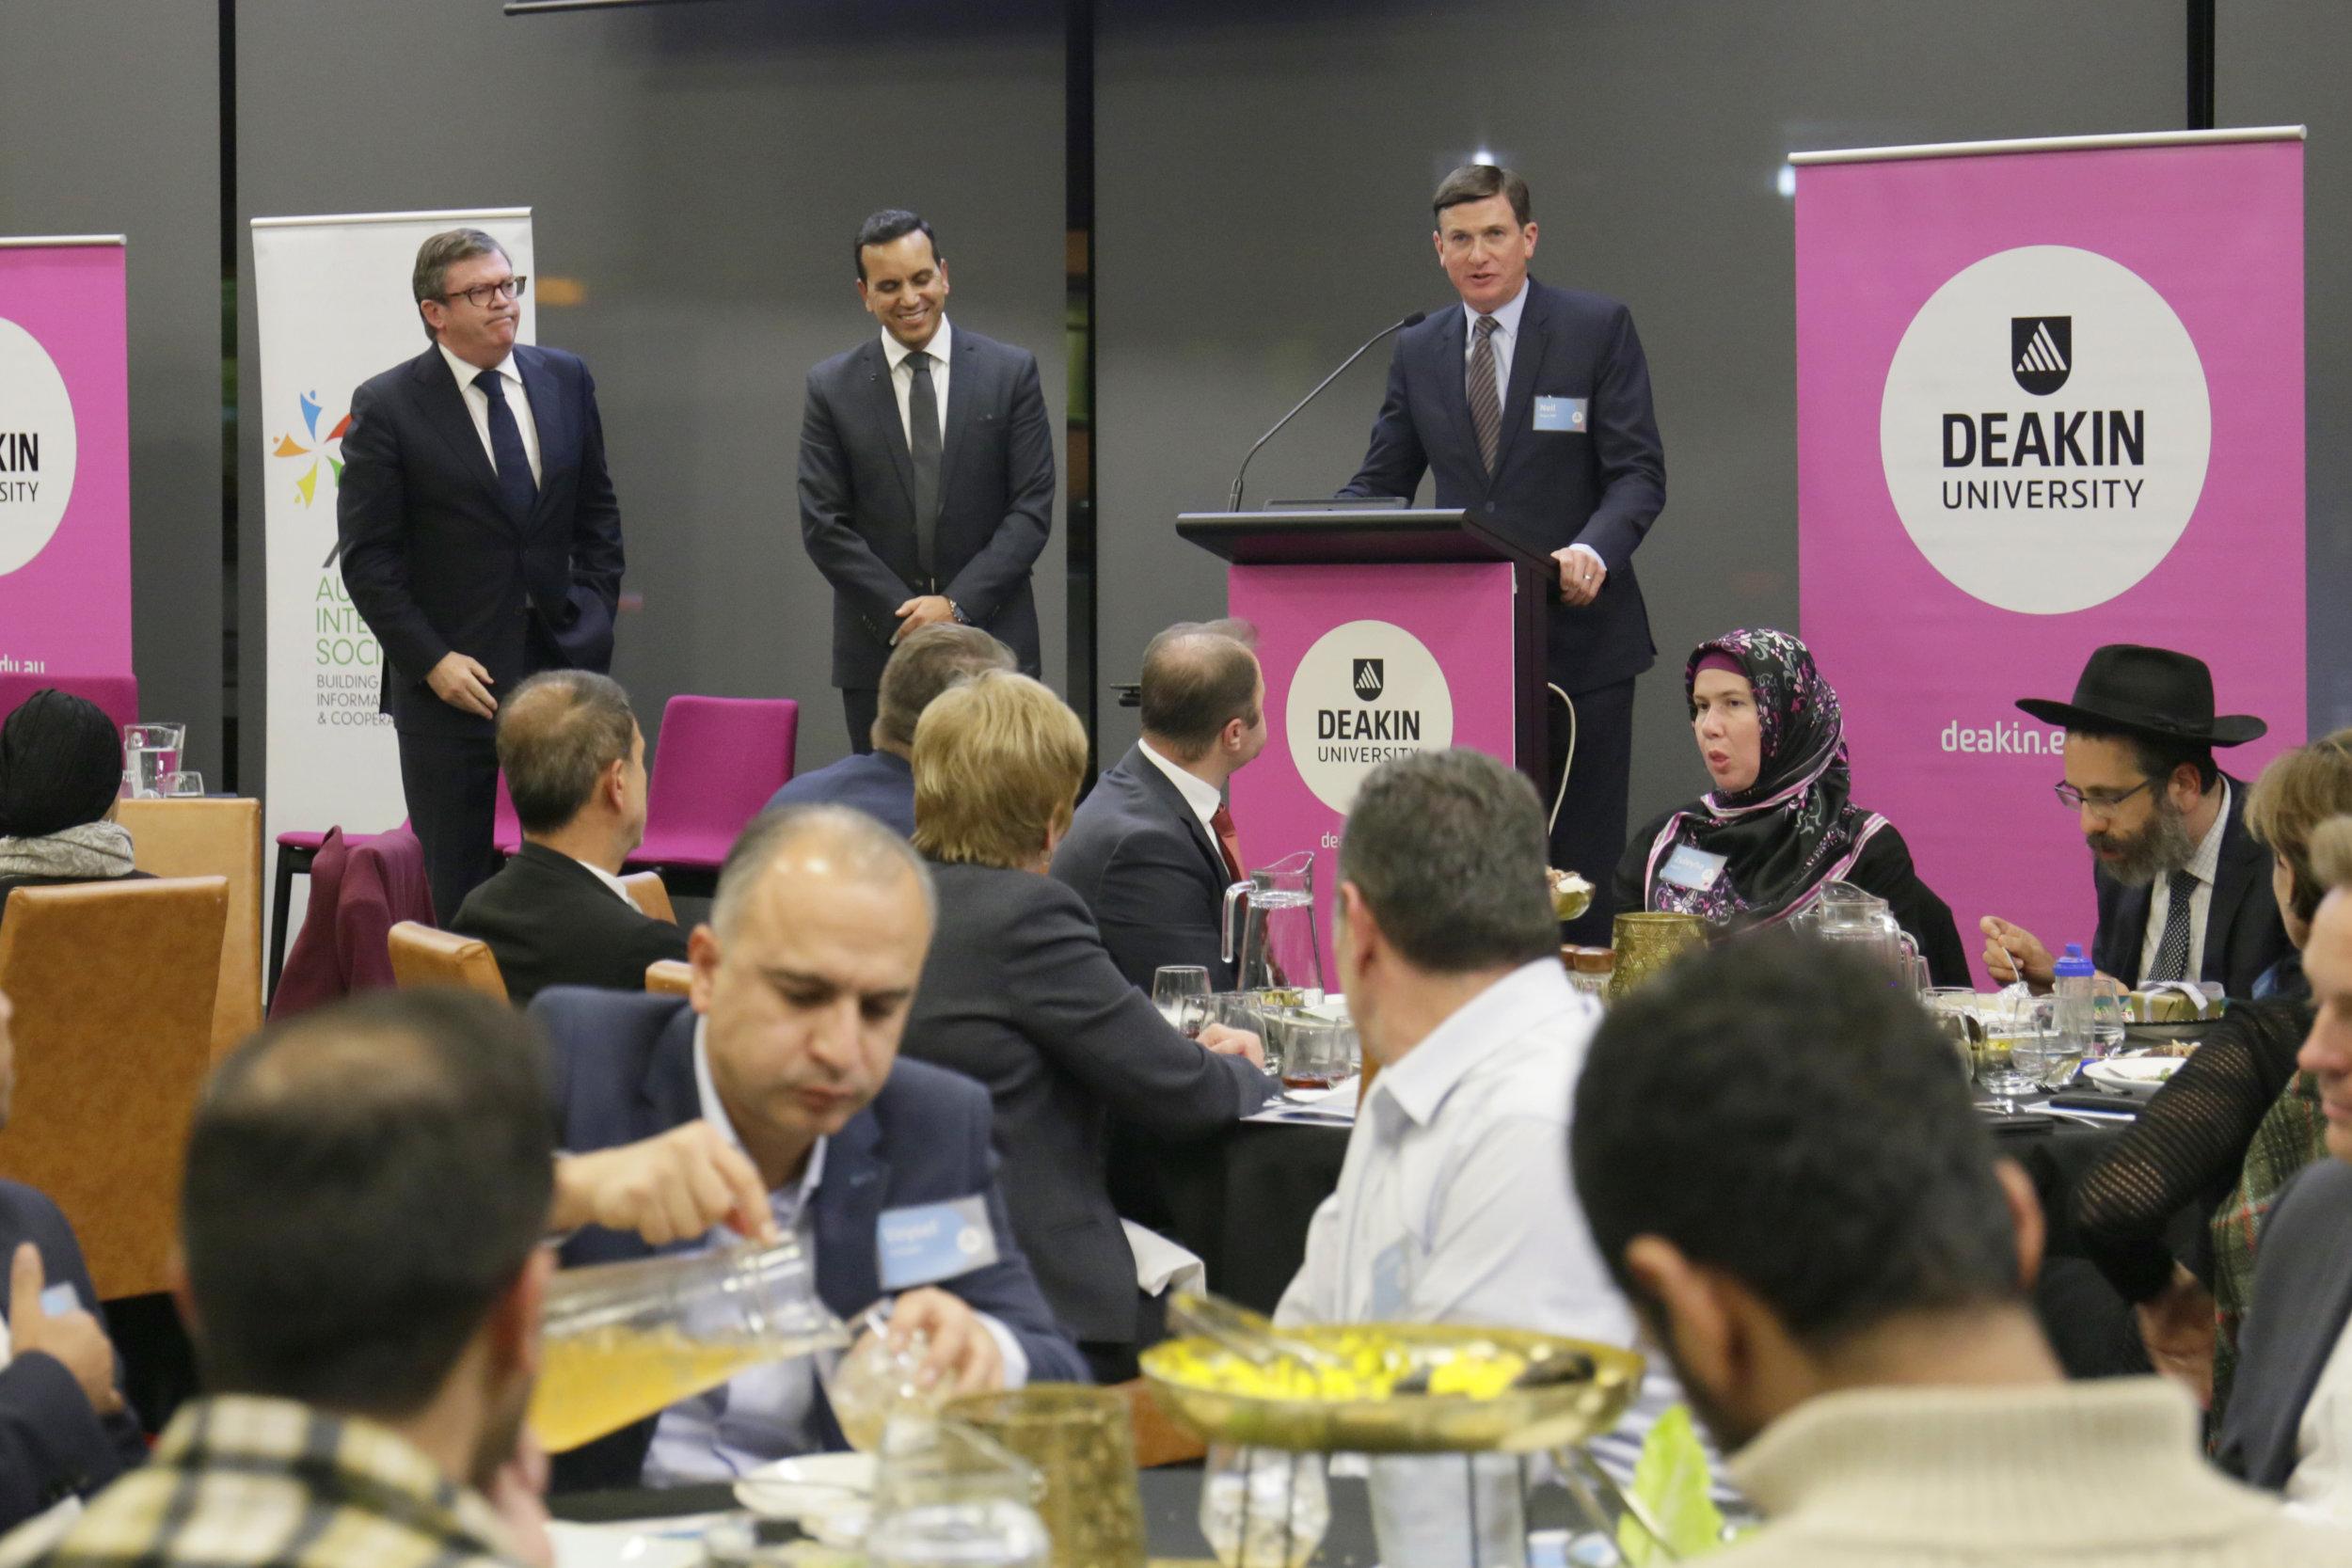 Mr Frank McGuire MP, Professor Fethi Mansouri and Mr Neil Angus MP.